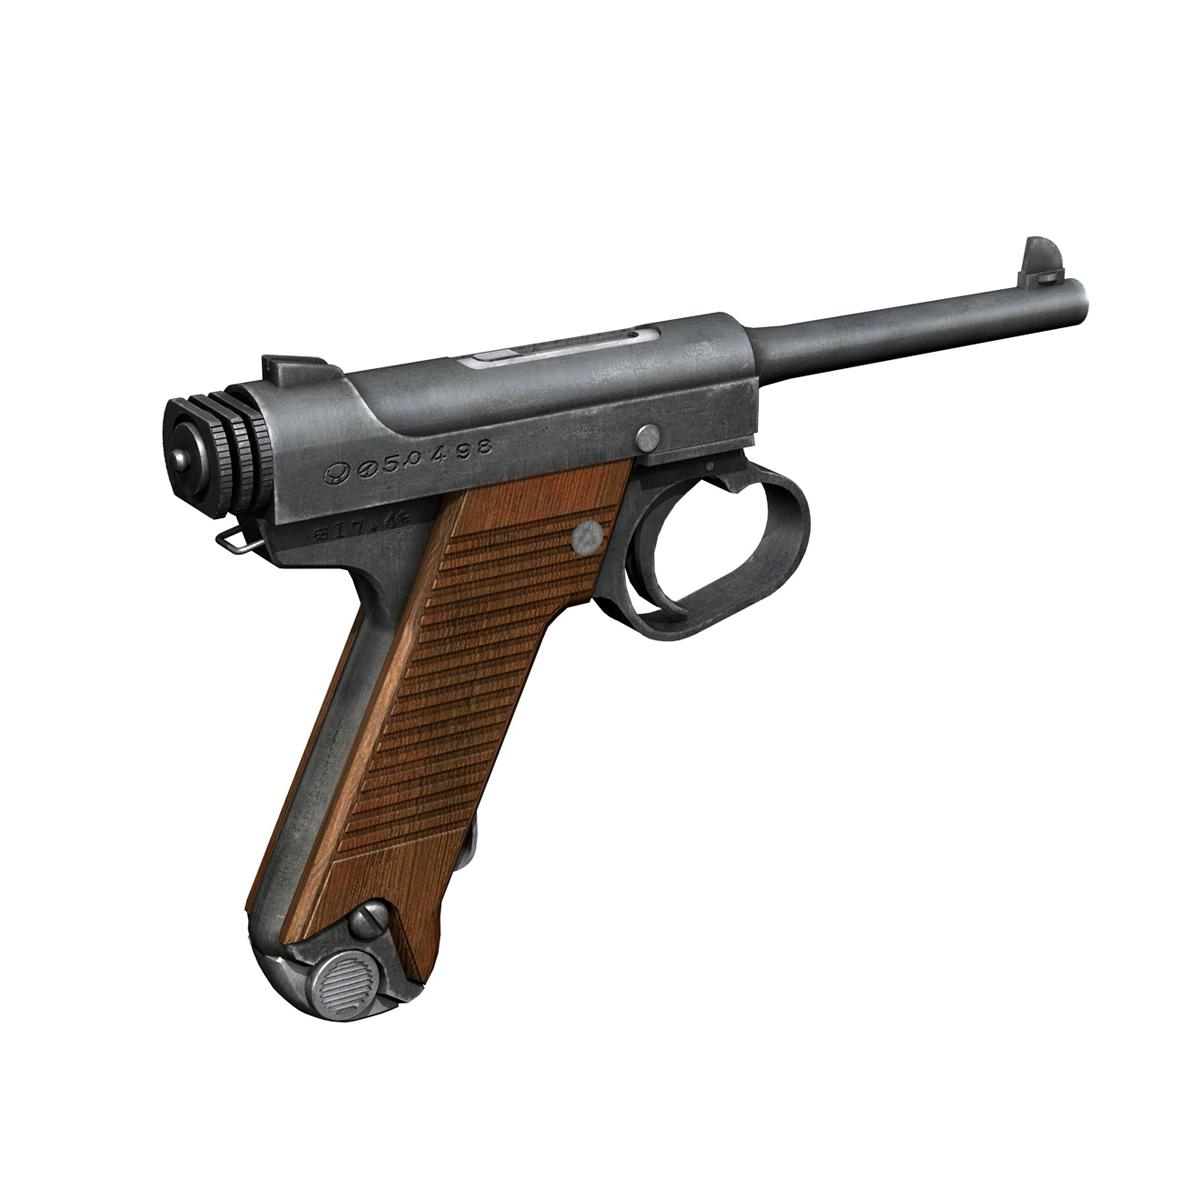 Nambu pištolj tip 14 3d model 3ds fbx c4d lwo obj 195155